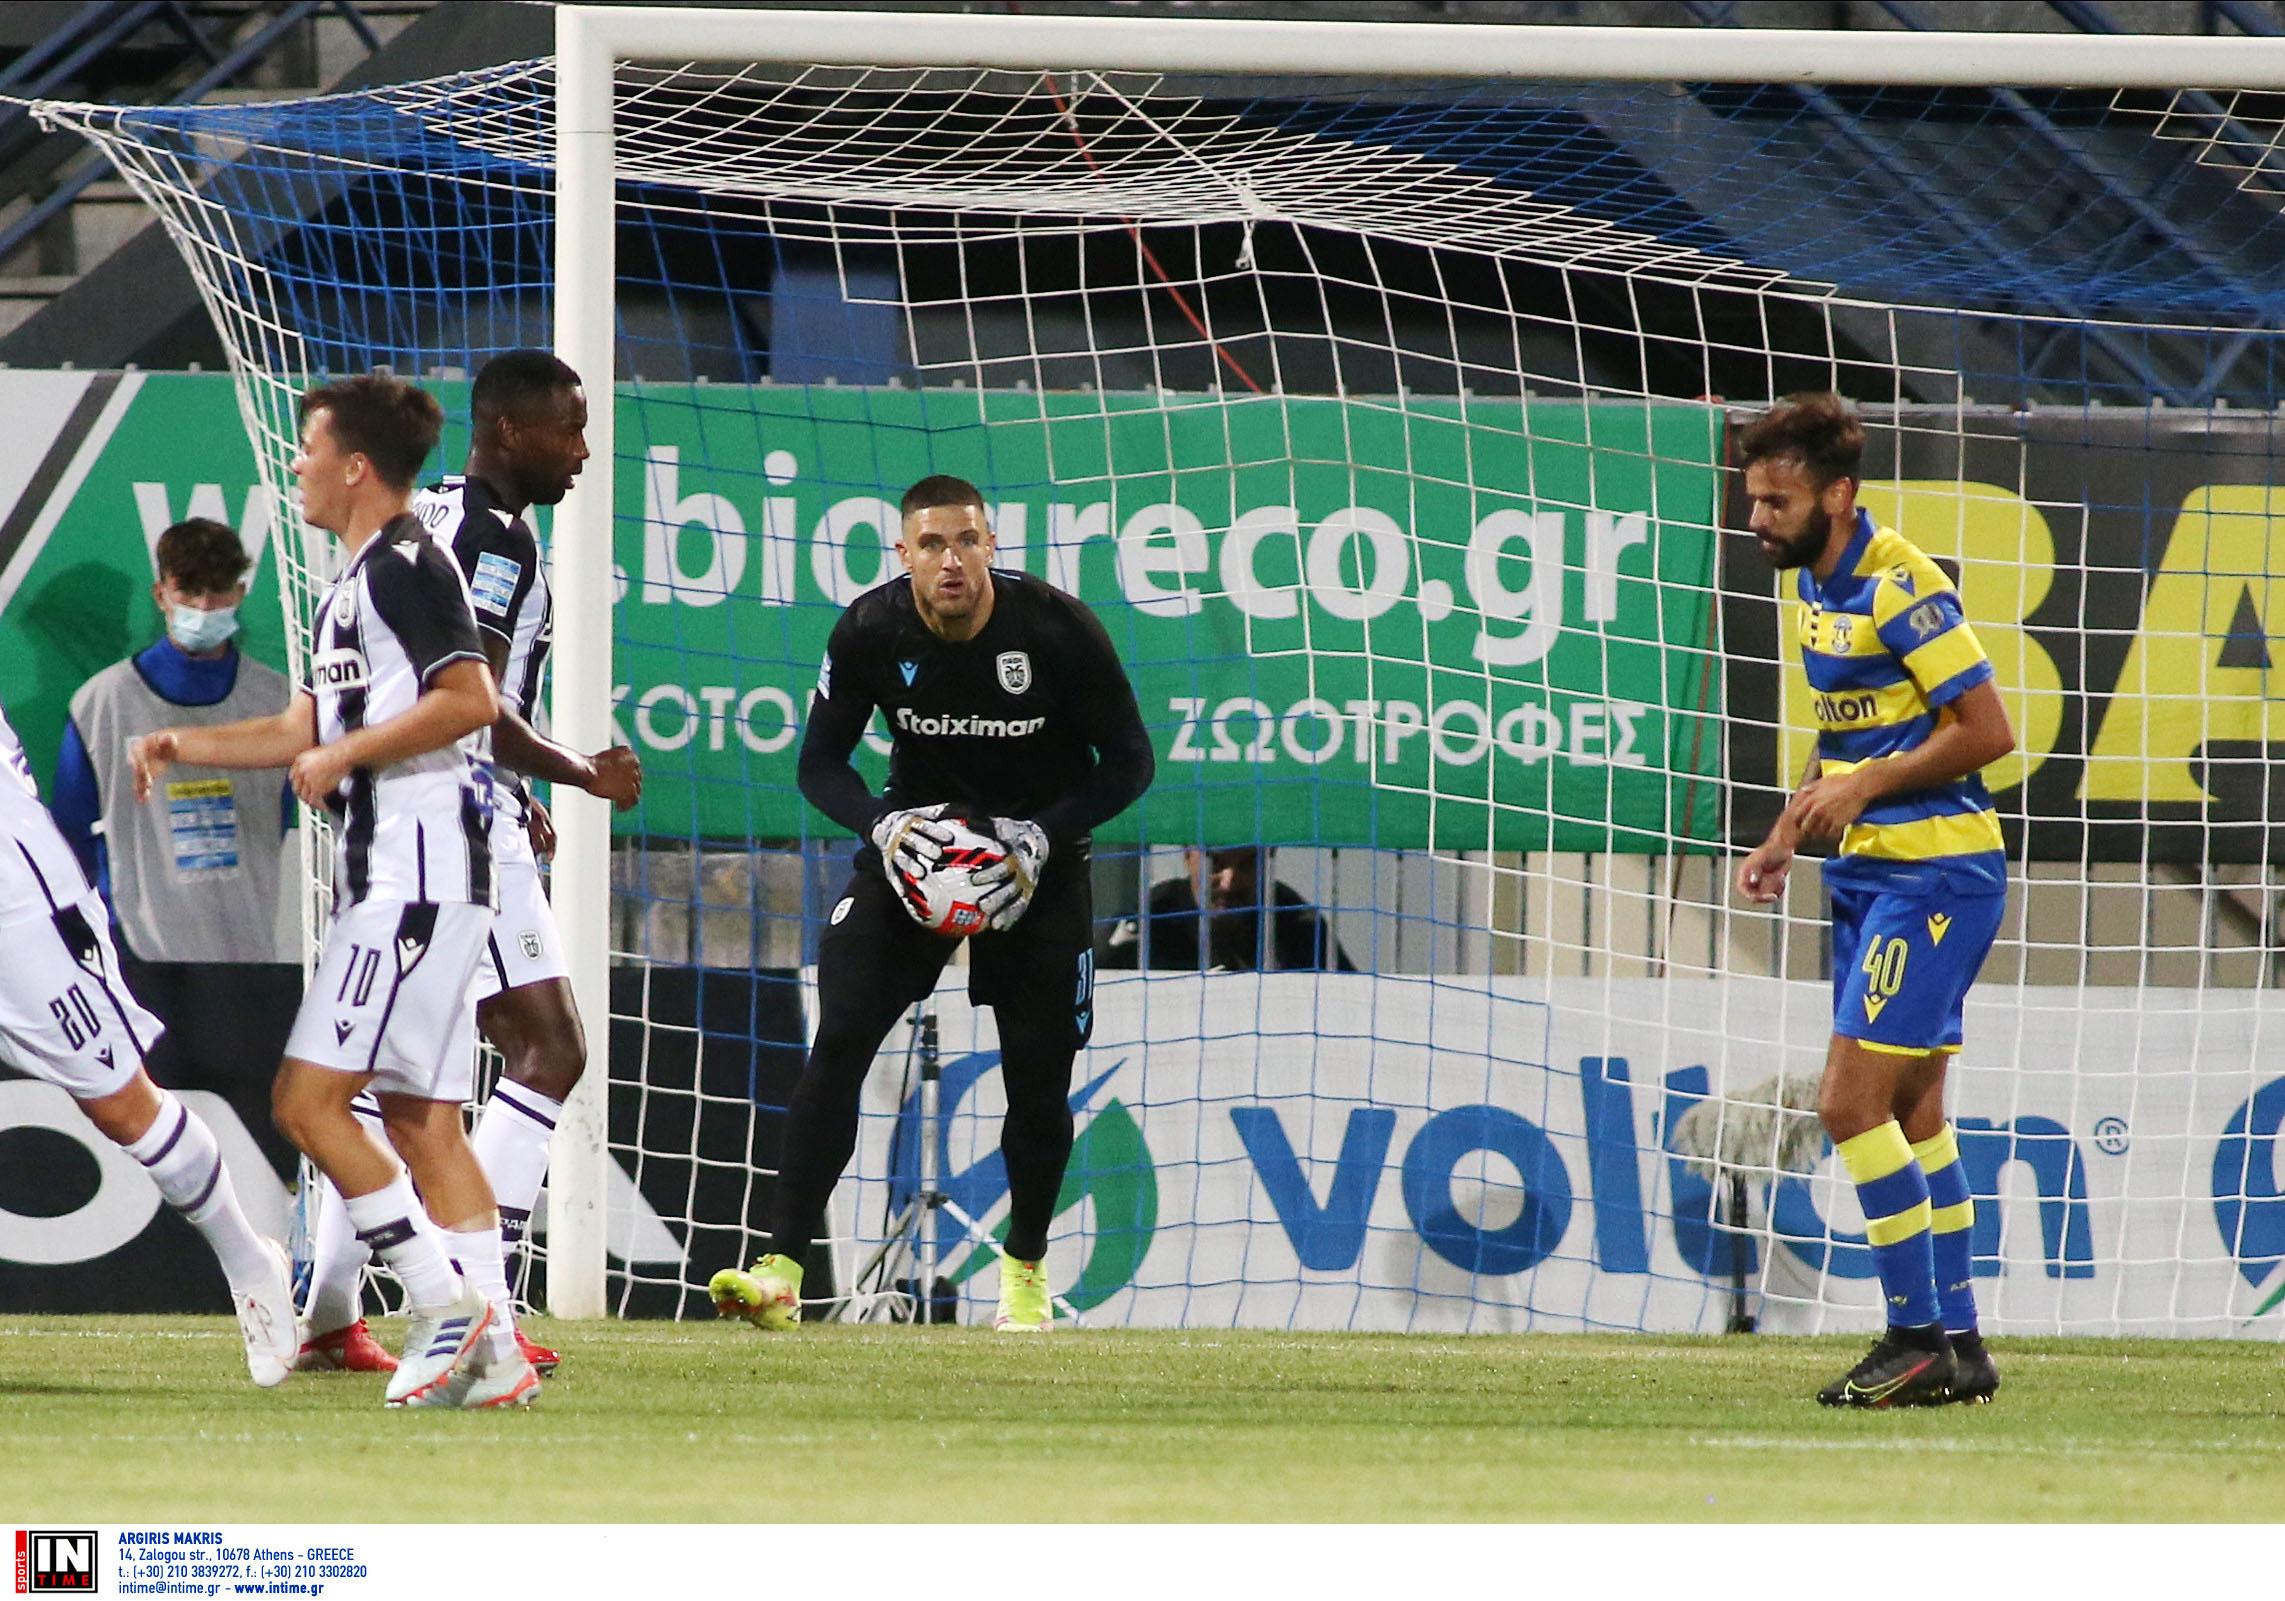 Superleague 1, Αστέρας Τρίπολης – ΠΑΟΚ 0-1: «Διπλό» με Πασχαλάκη και ζόρι